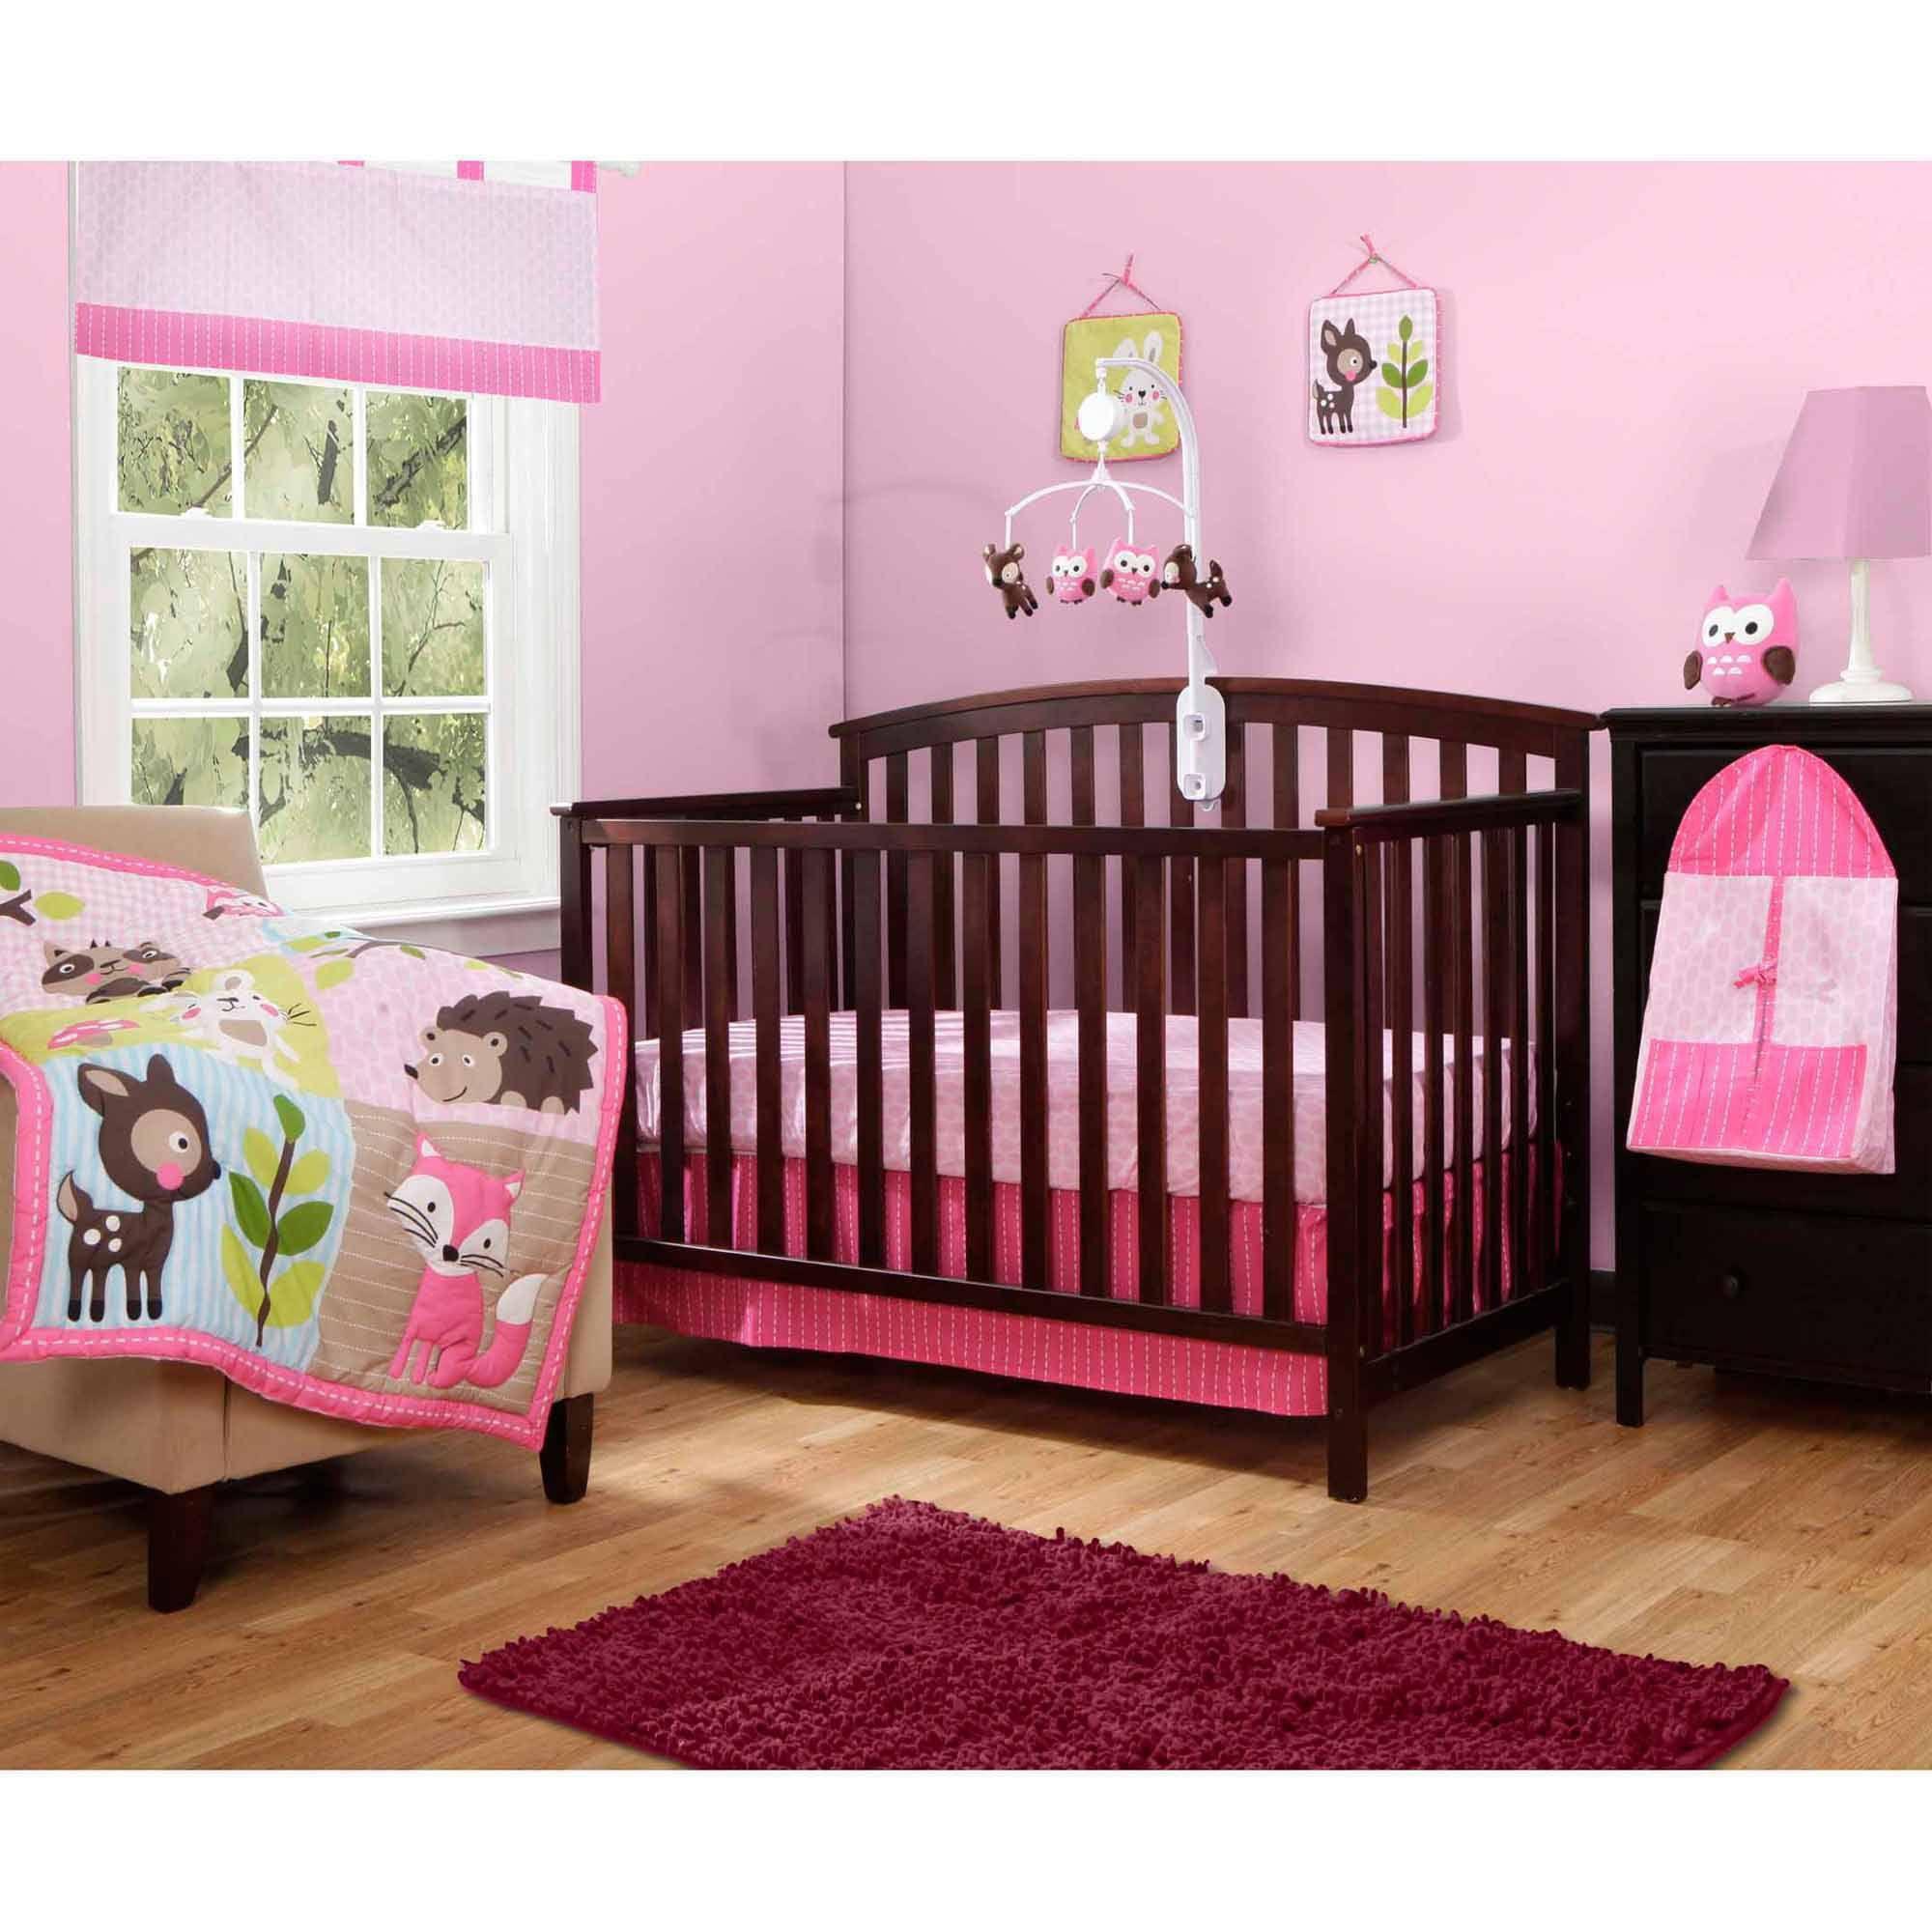 Baby Boom Woodland Girl 10 Piece Crib Bedding Set